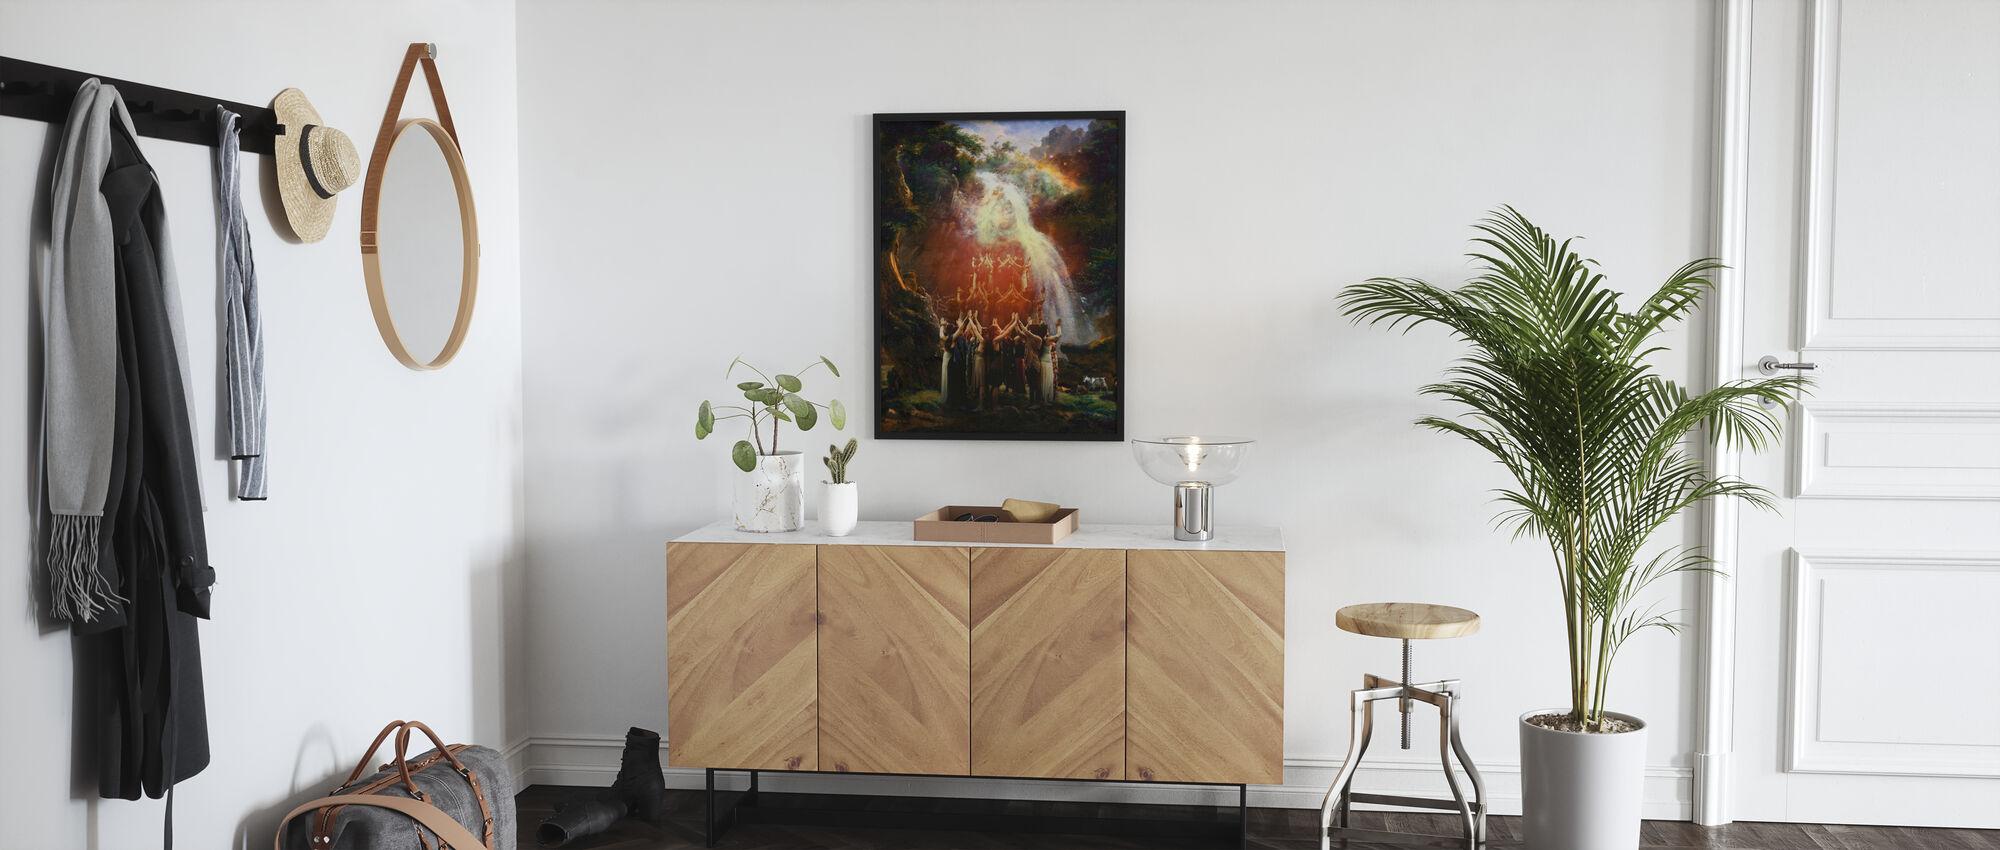 New World Order - Poster - Hallway